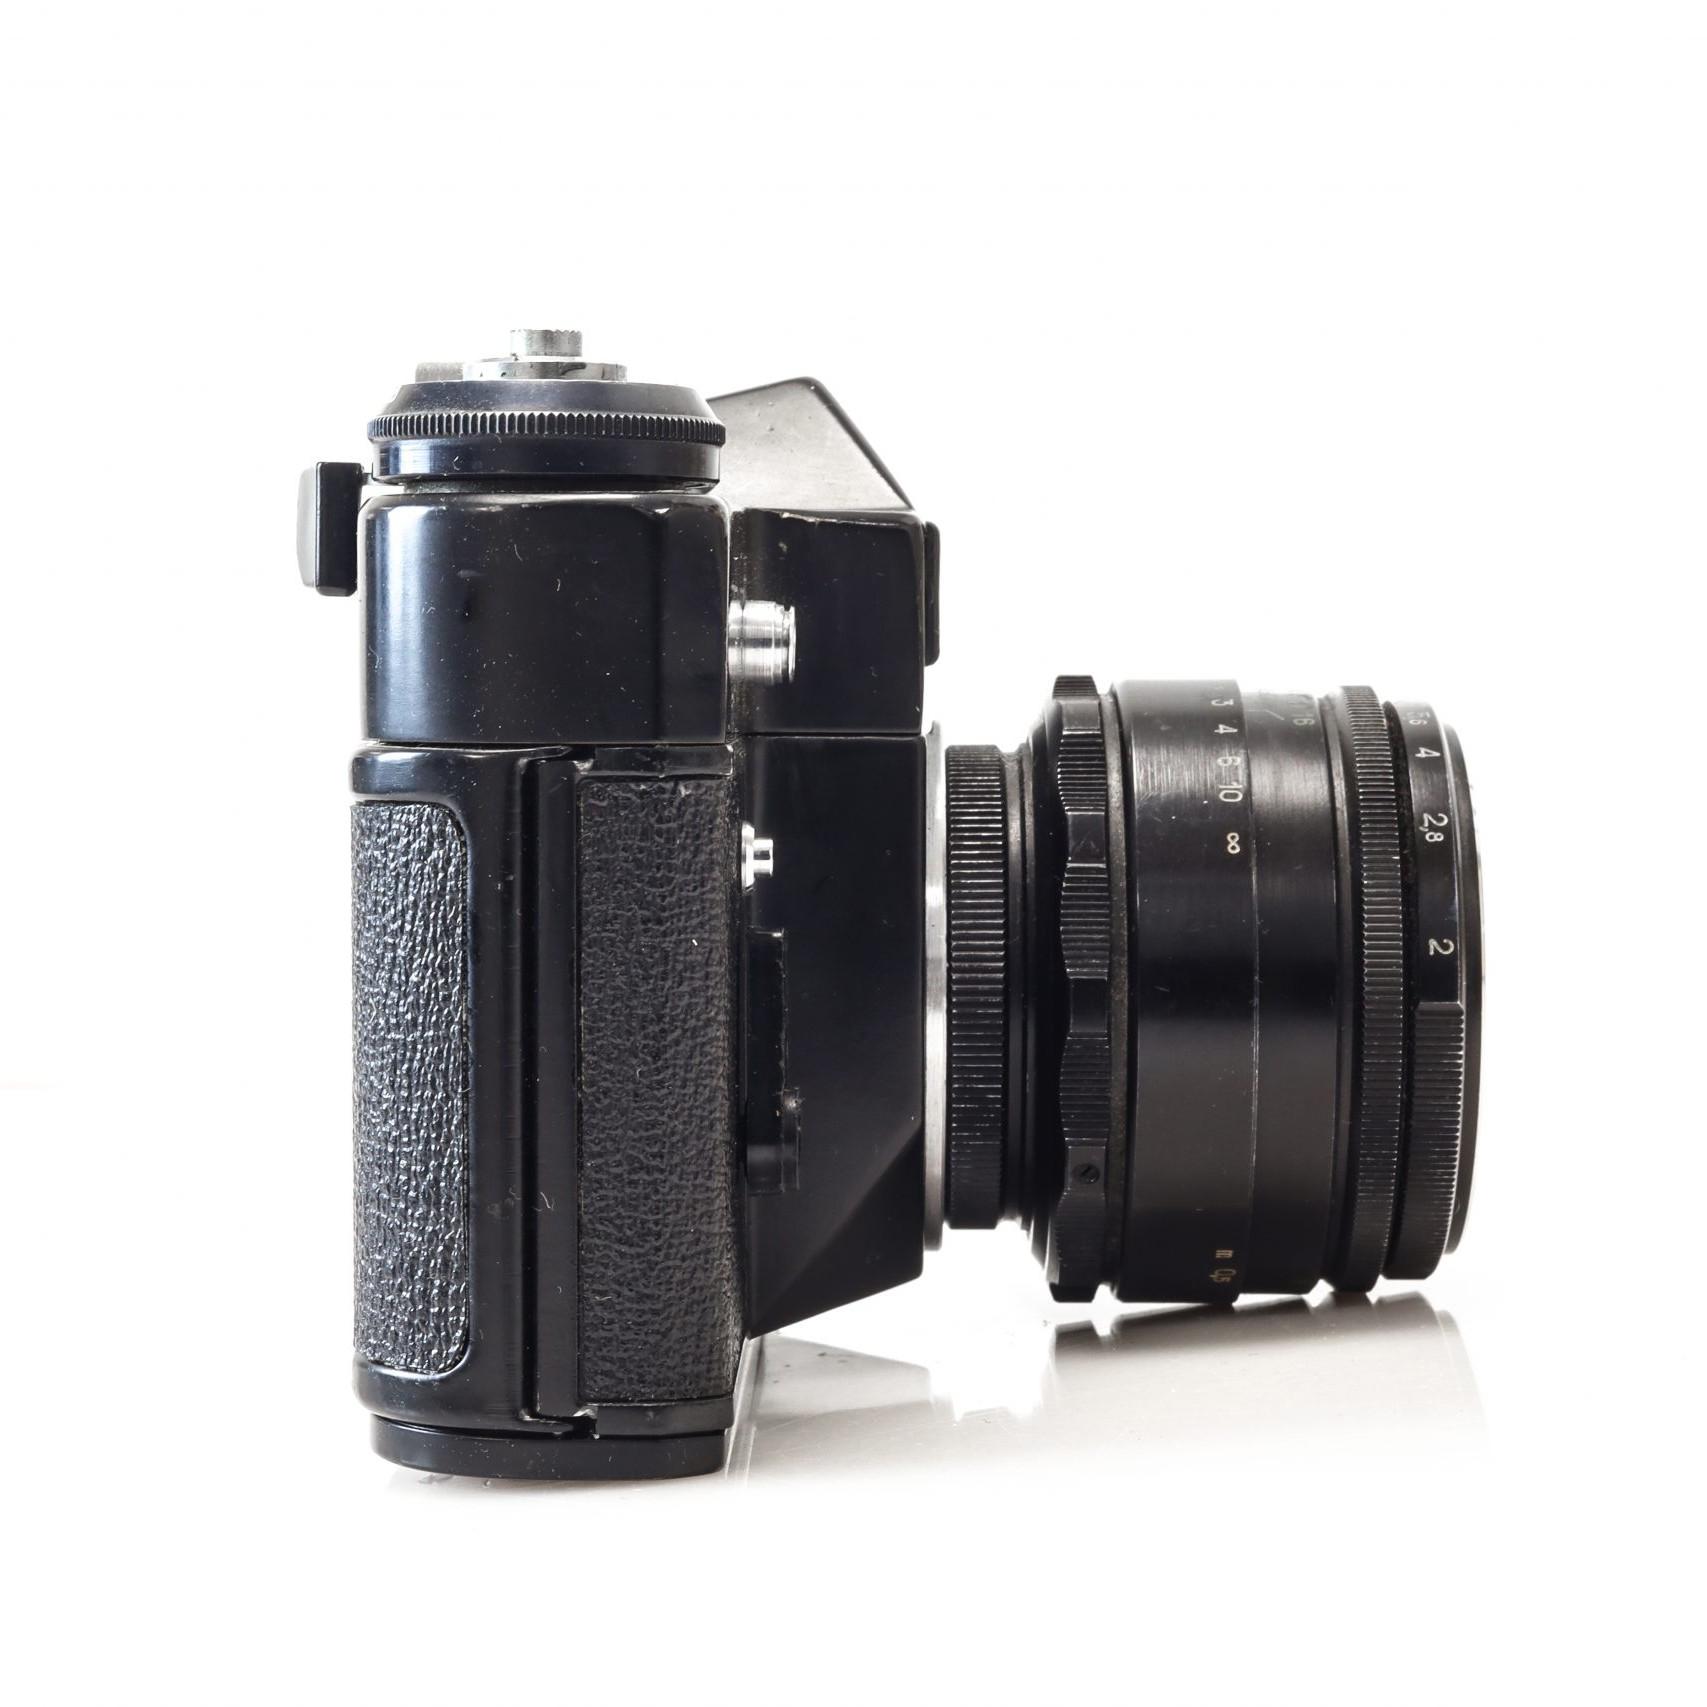 Stunning Zenit E 35mm Soviet Film Camera with Helios 44-2 Lens